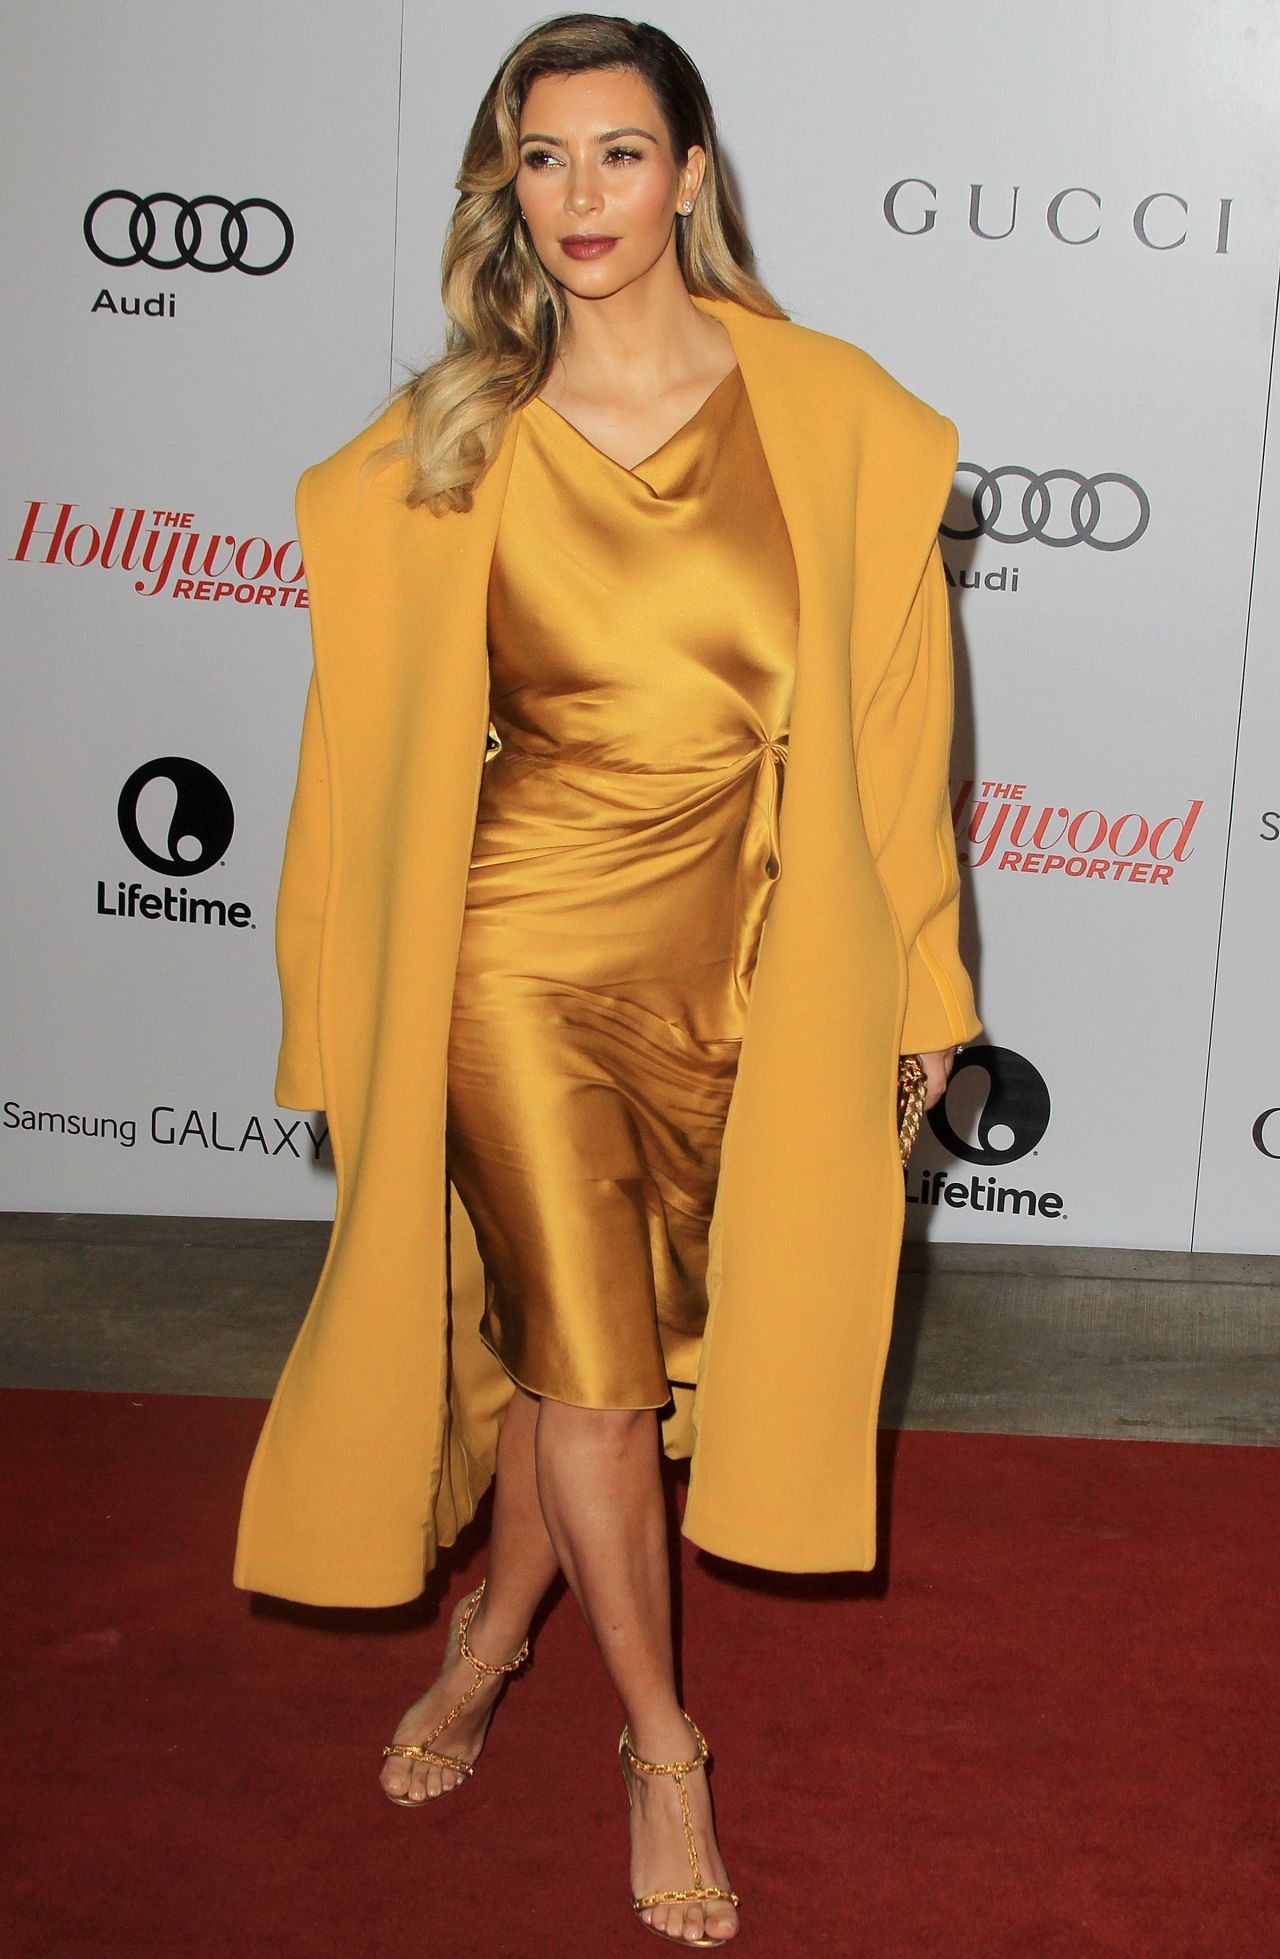 Kim Kardashian  Lights Up The Red Carpet In Yellow - THR